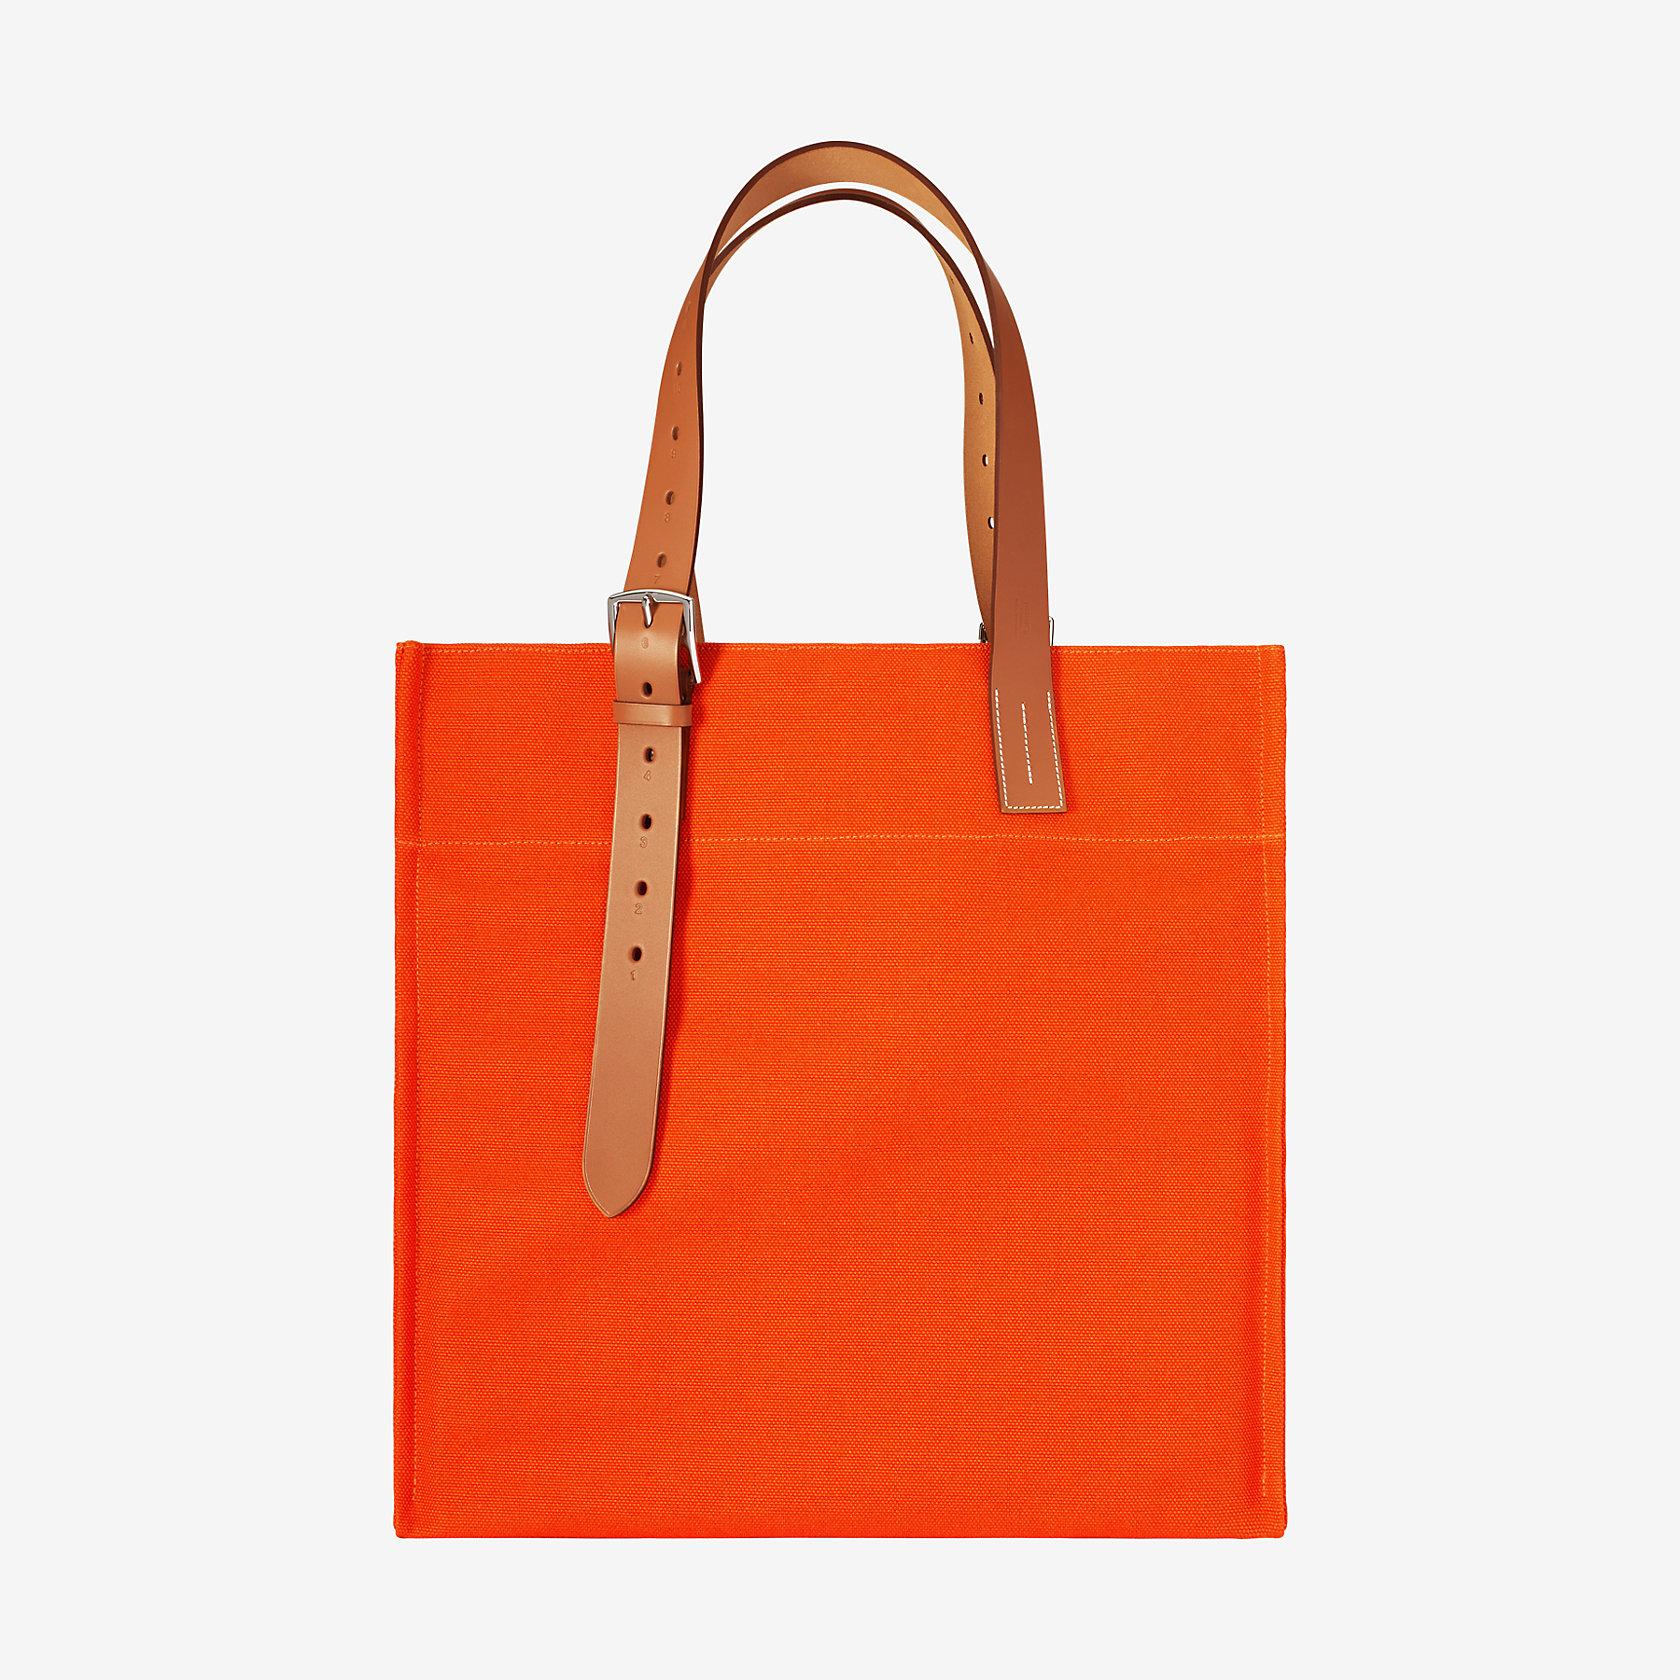 promo code hermes handbag collection shop 5a440 33f02